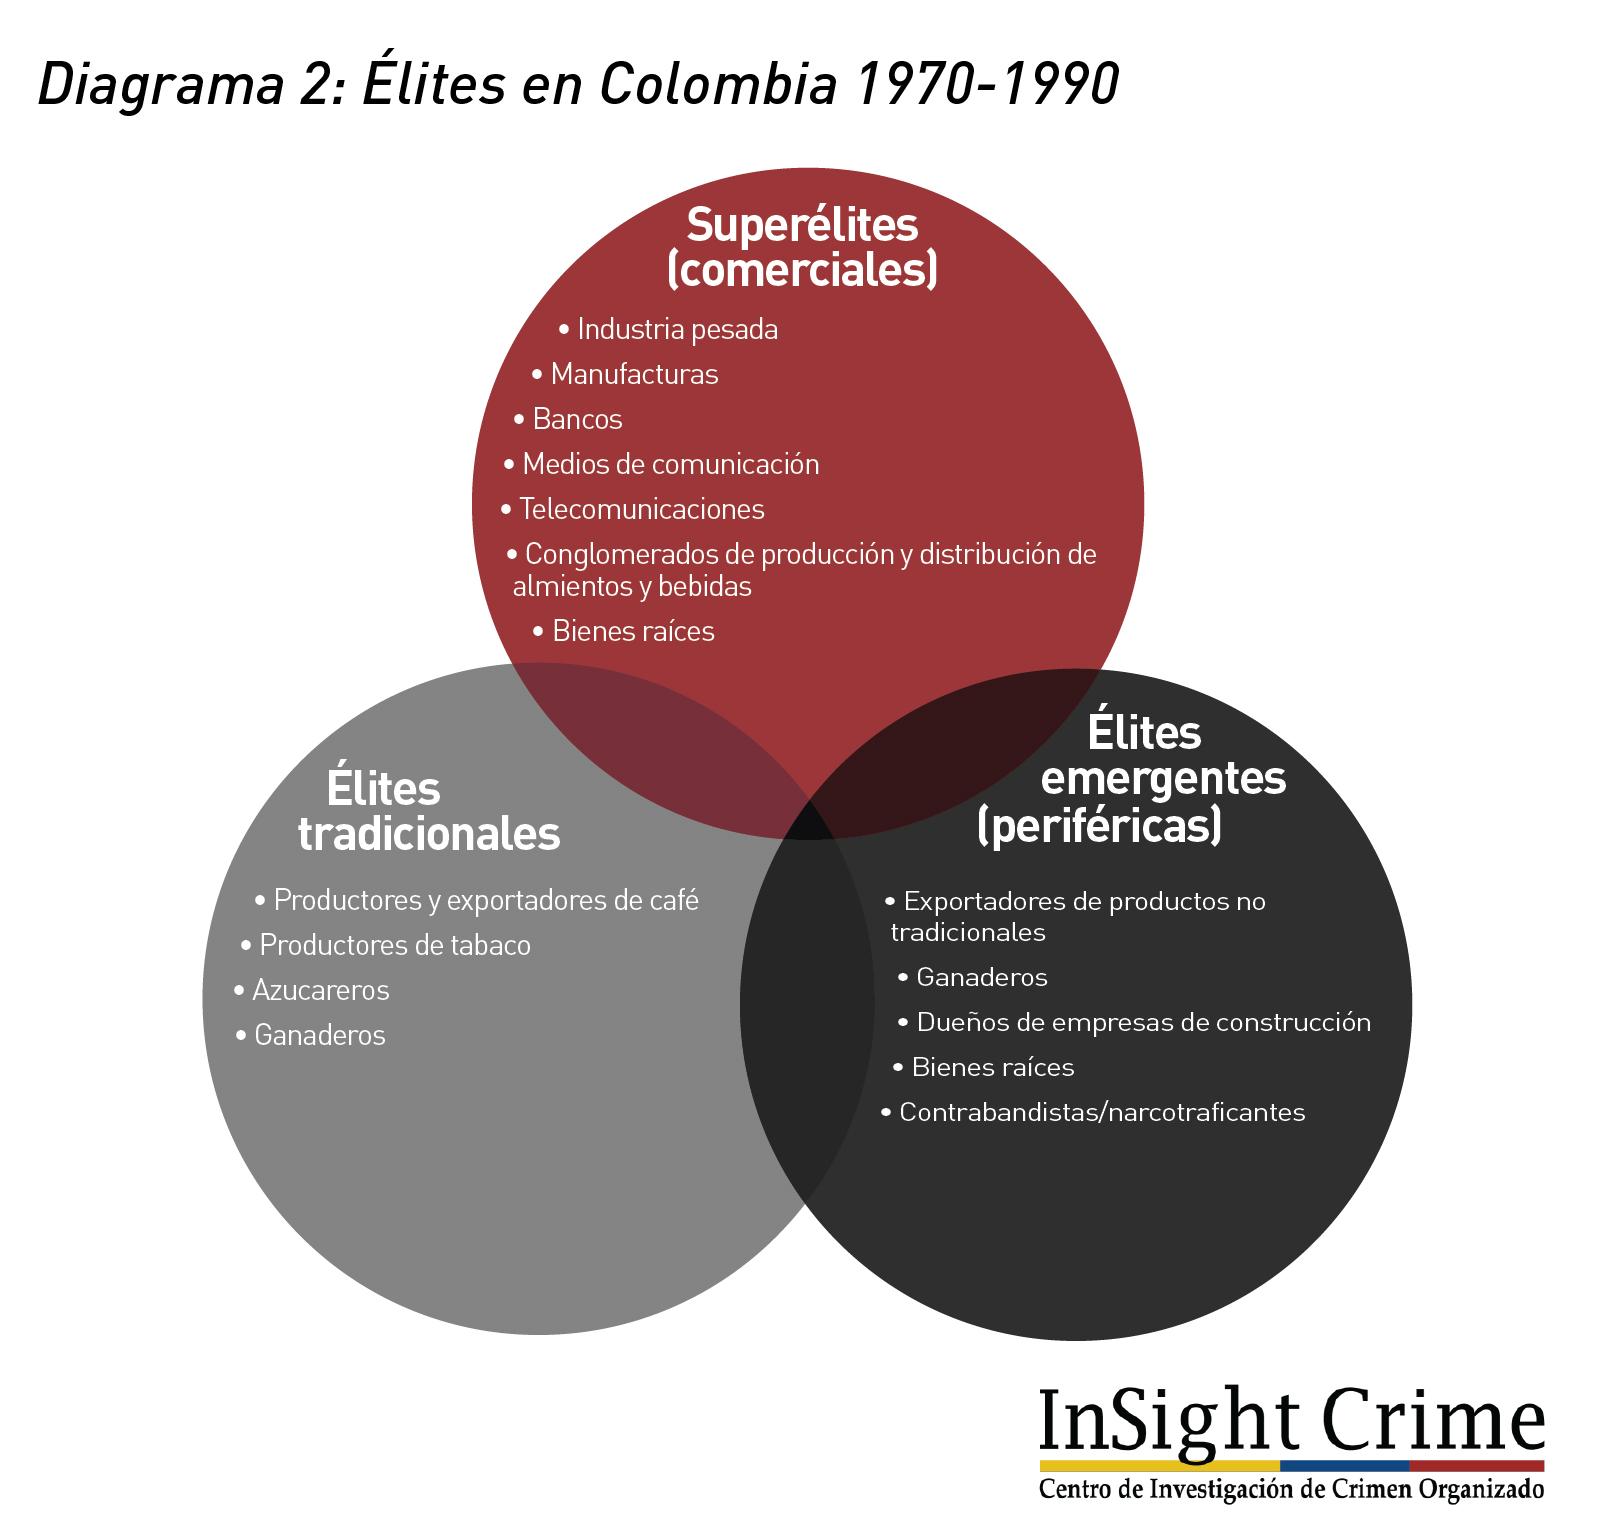 Diagrama2 Colombia Elite 1970 1990